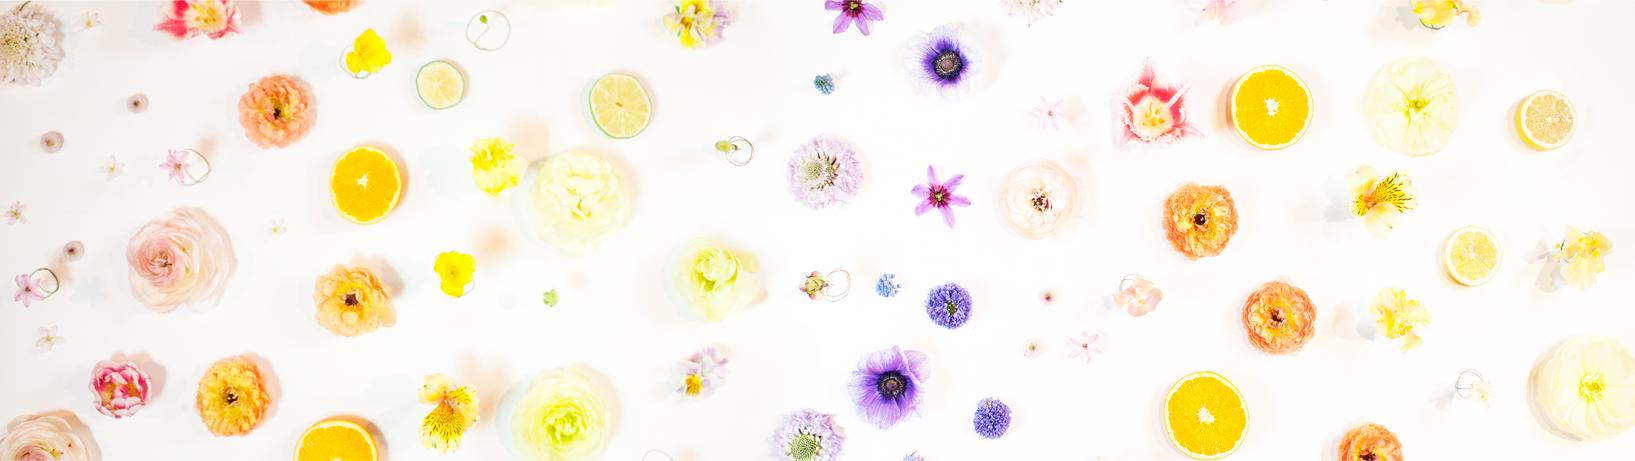 flowerarrangement-grace-daikanyama-home-slider-image_05